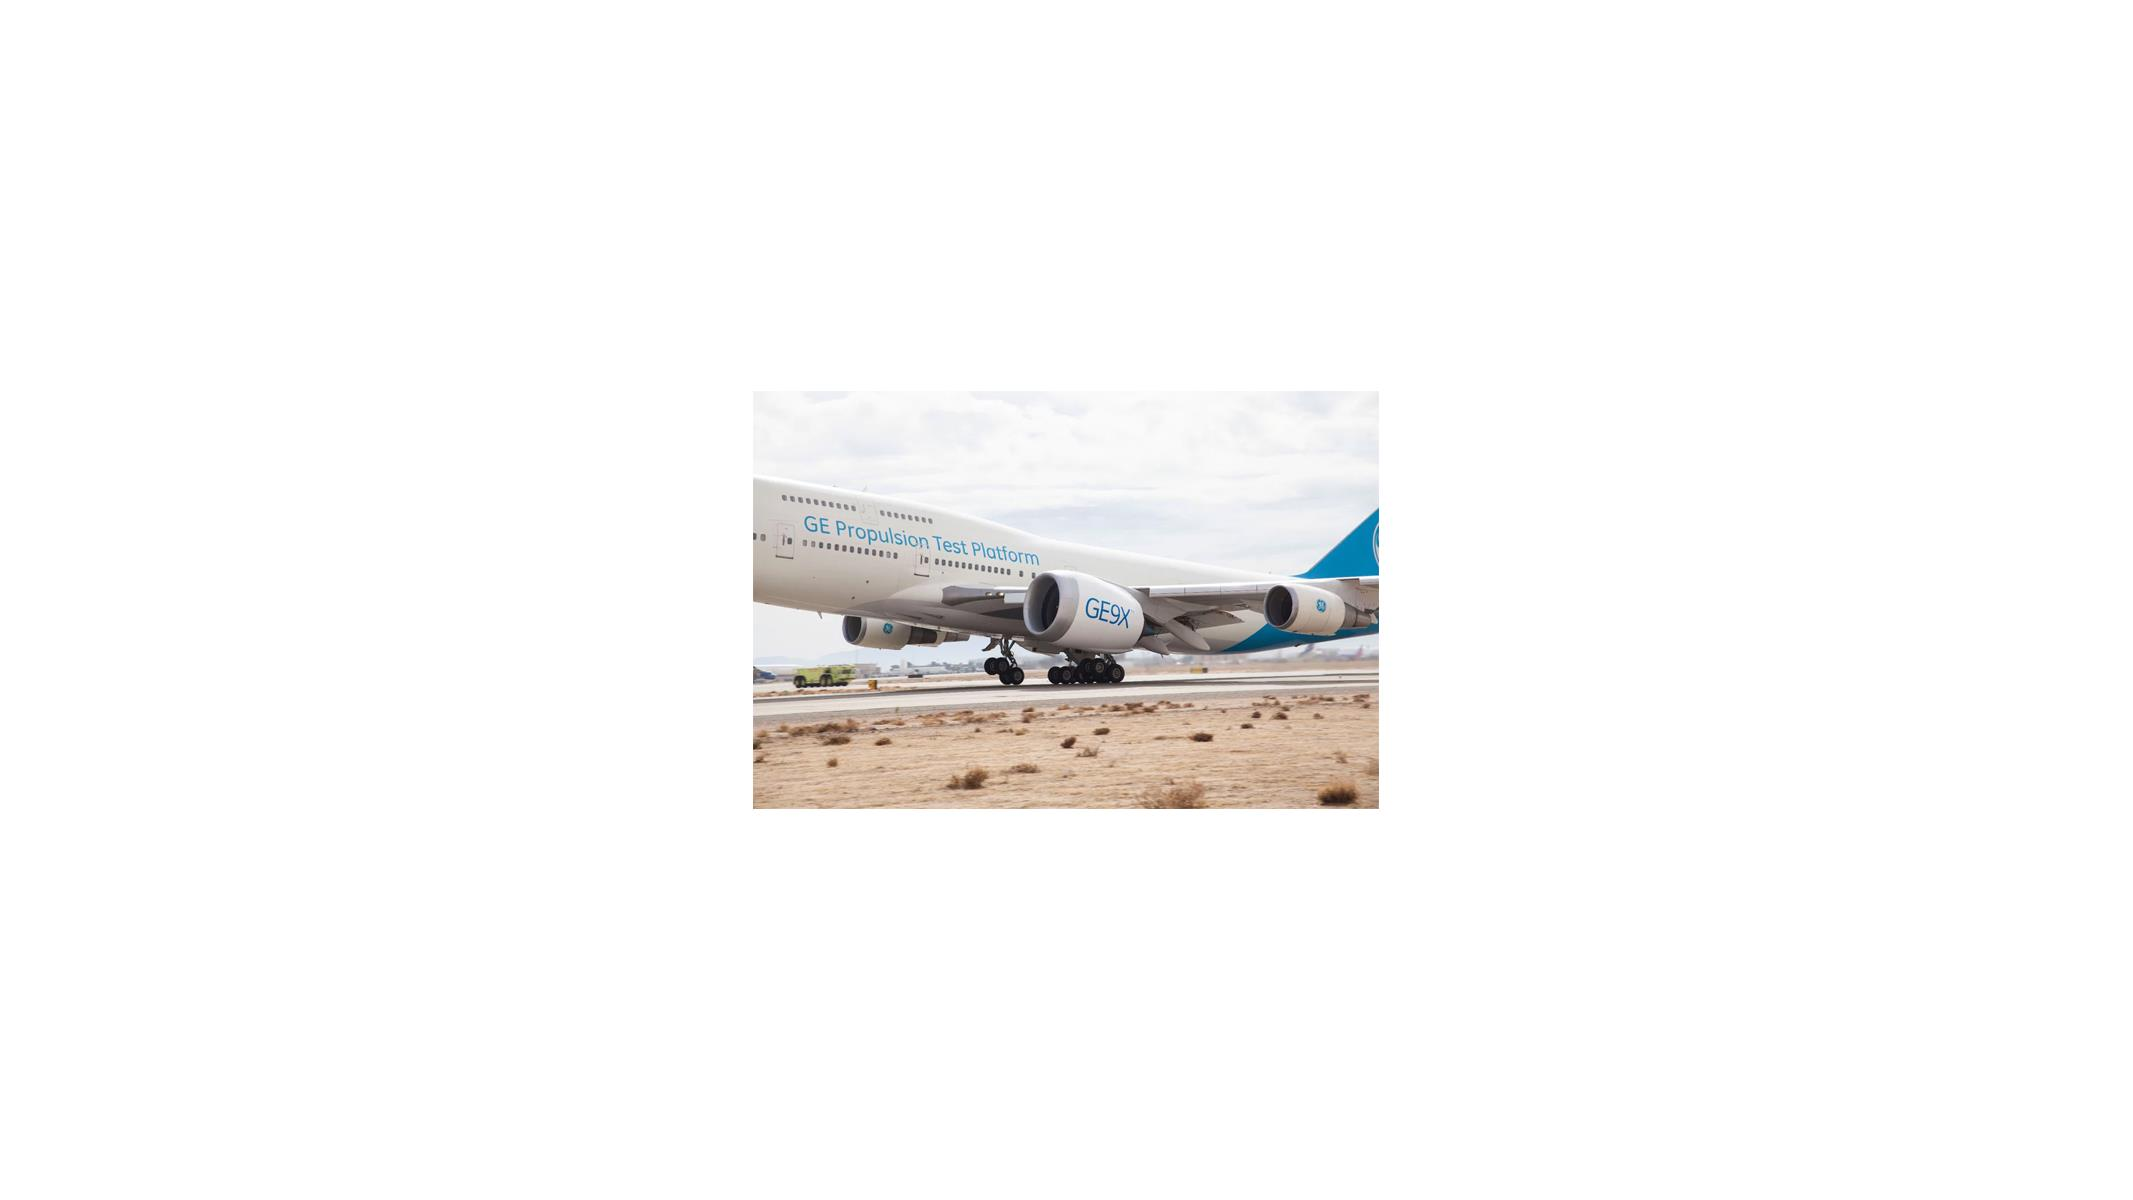 World's Largest Jet Engine, GE Aviation GE9X, Makes Debut